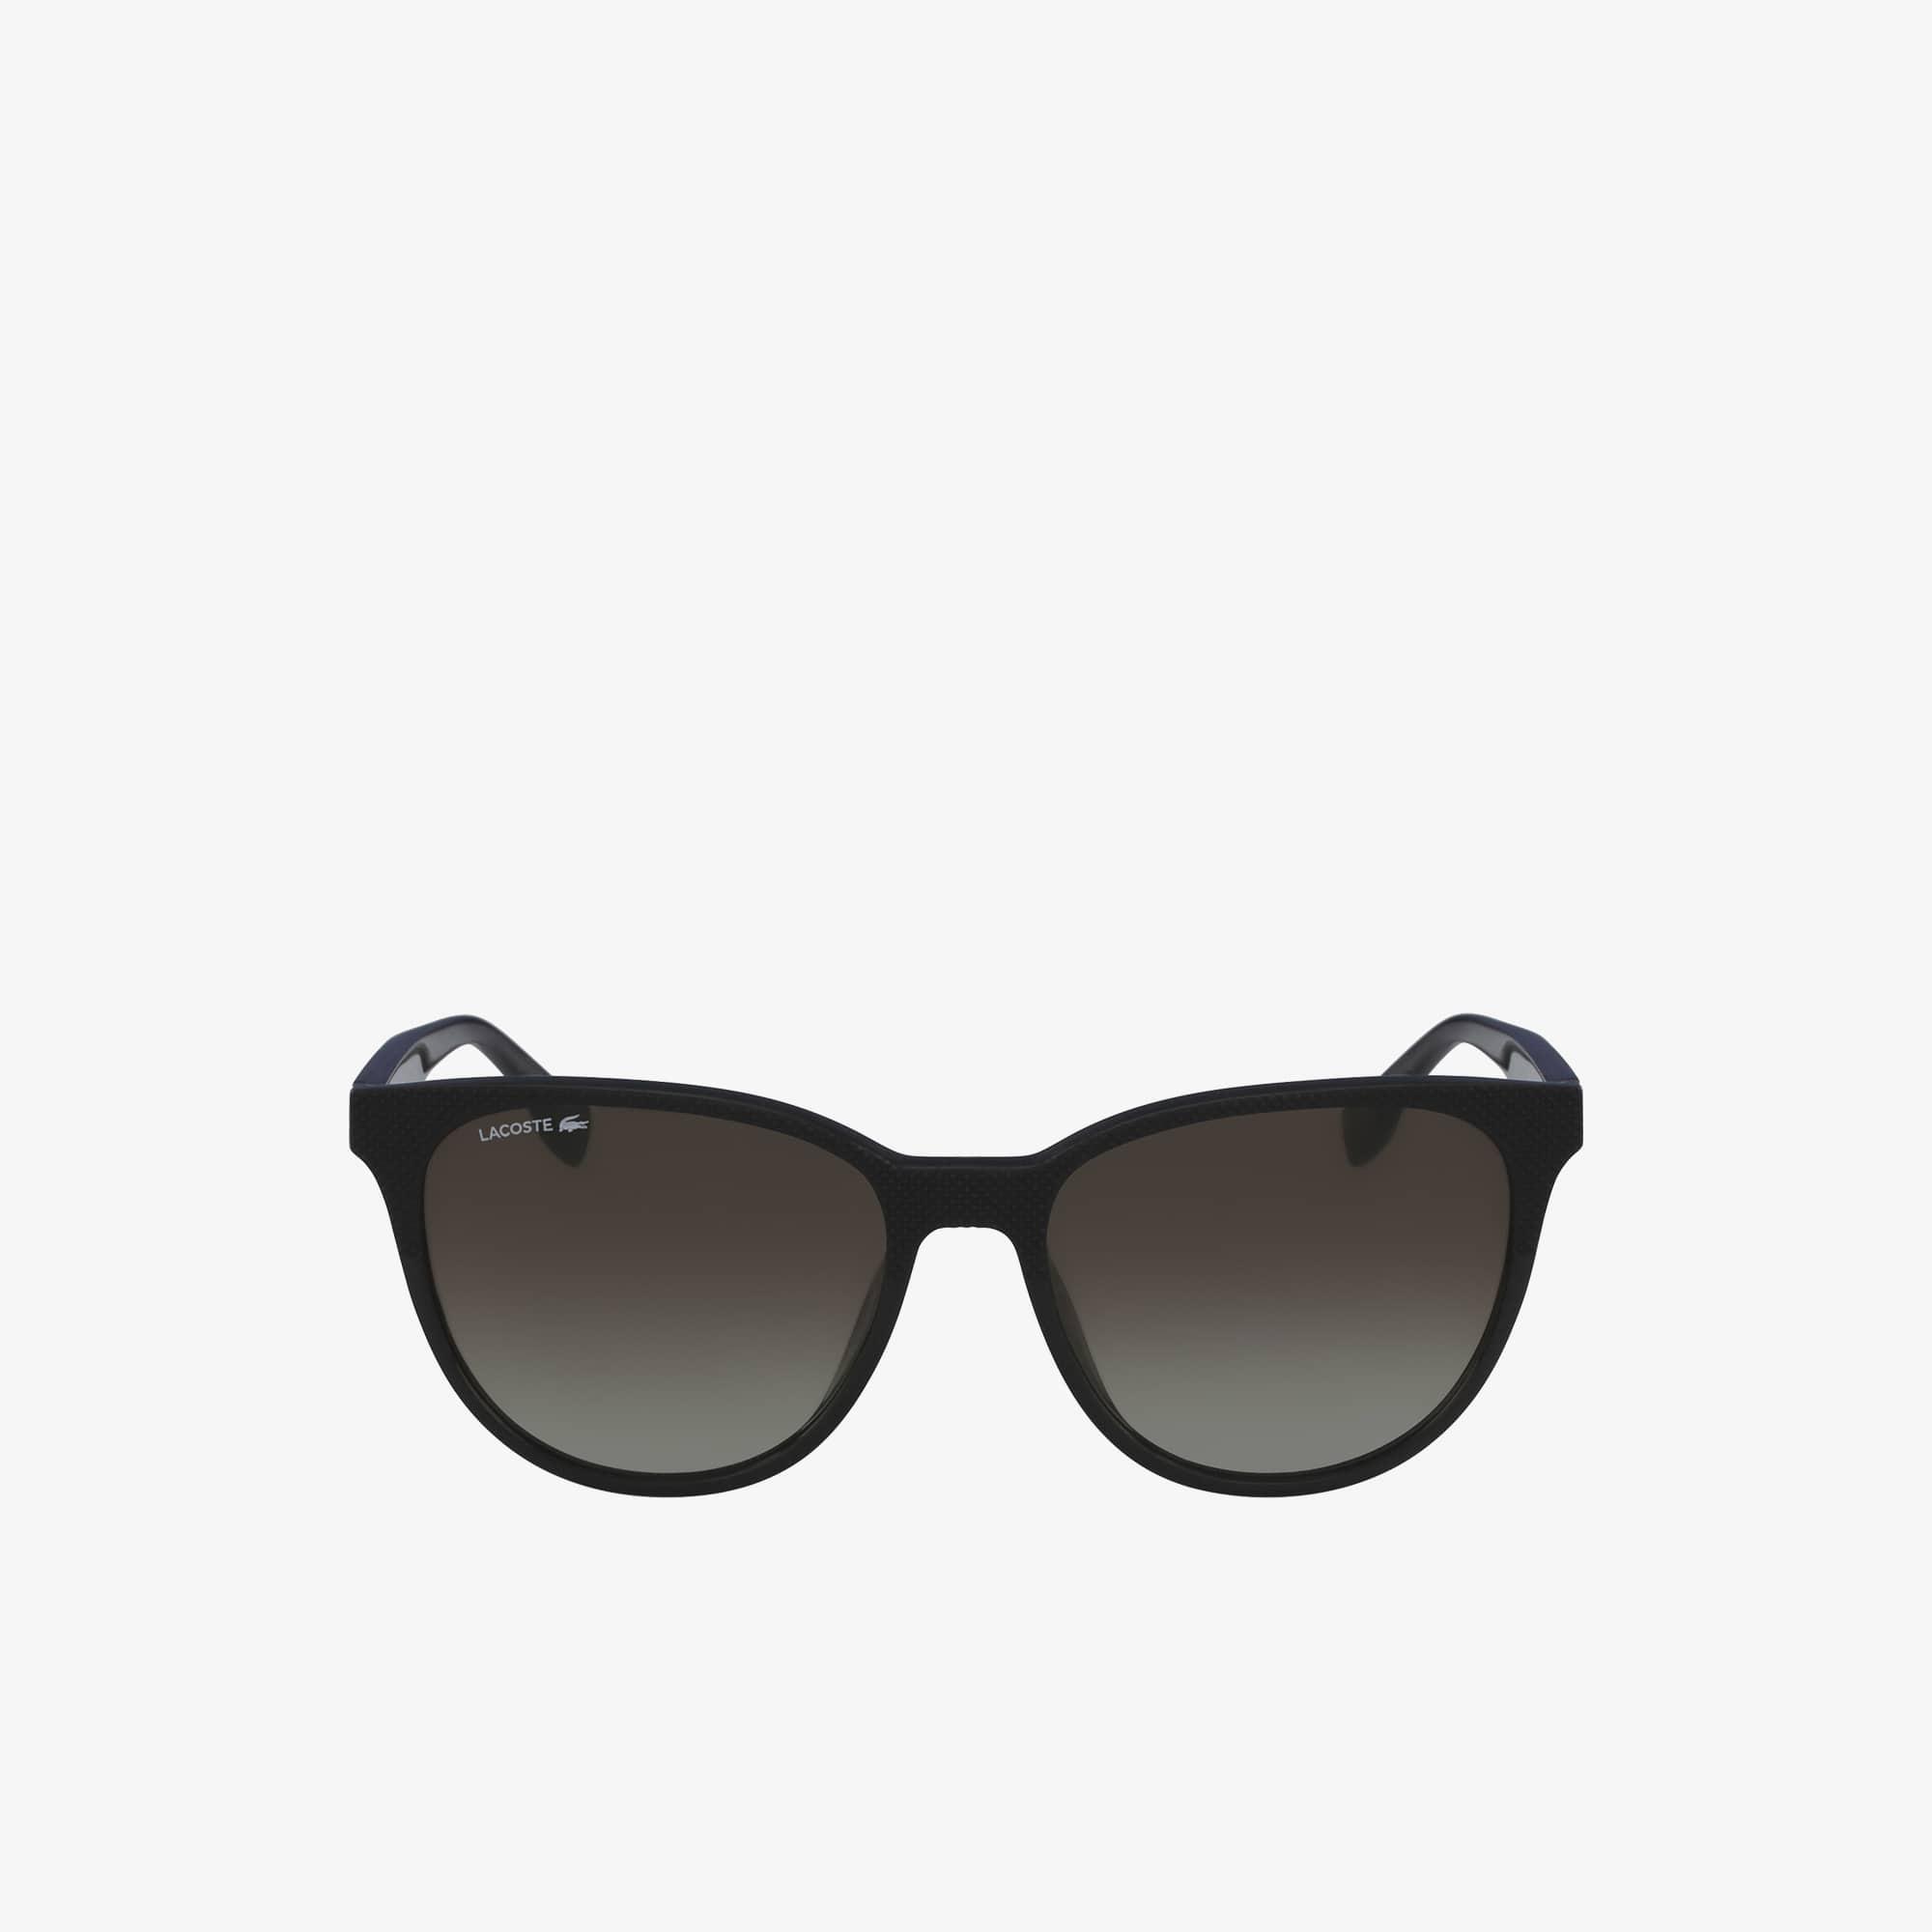 Women's L.12.12 Sunglasses